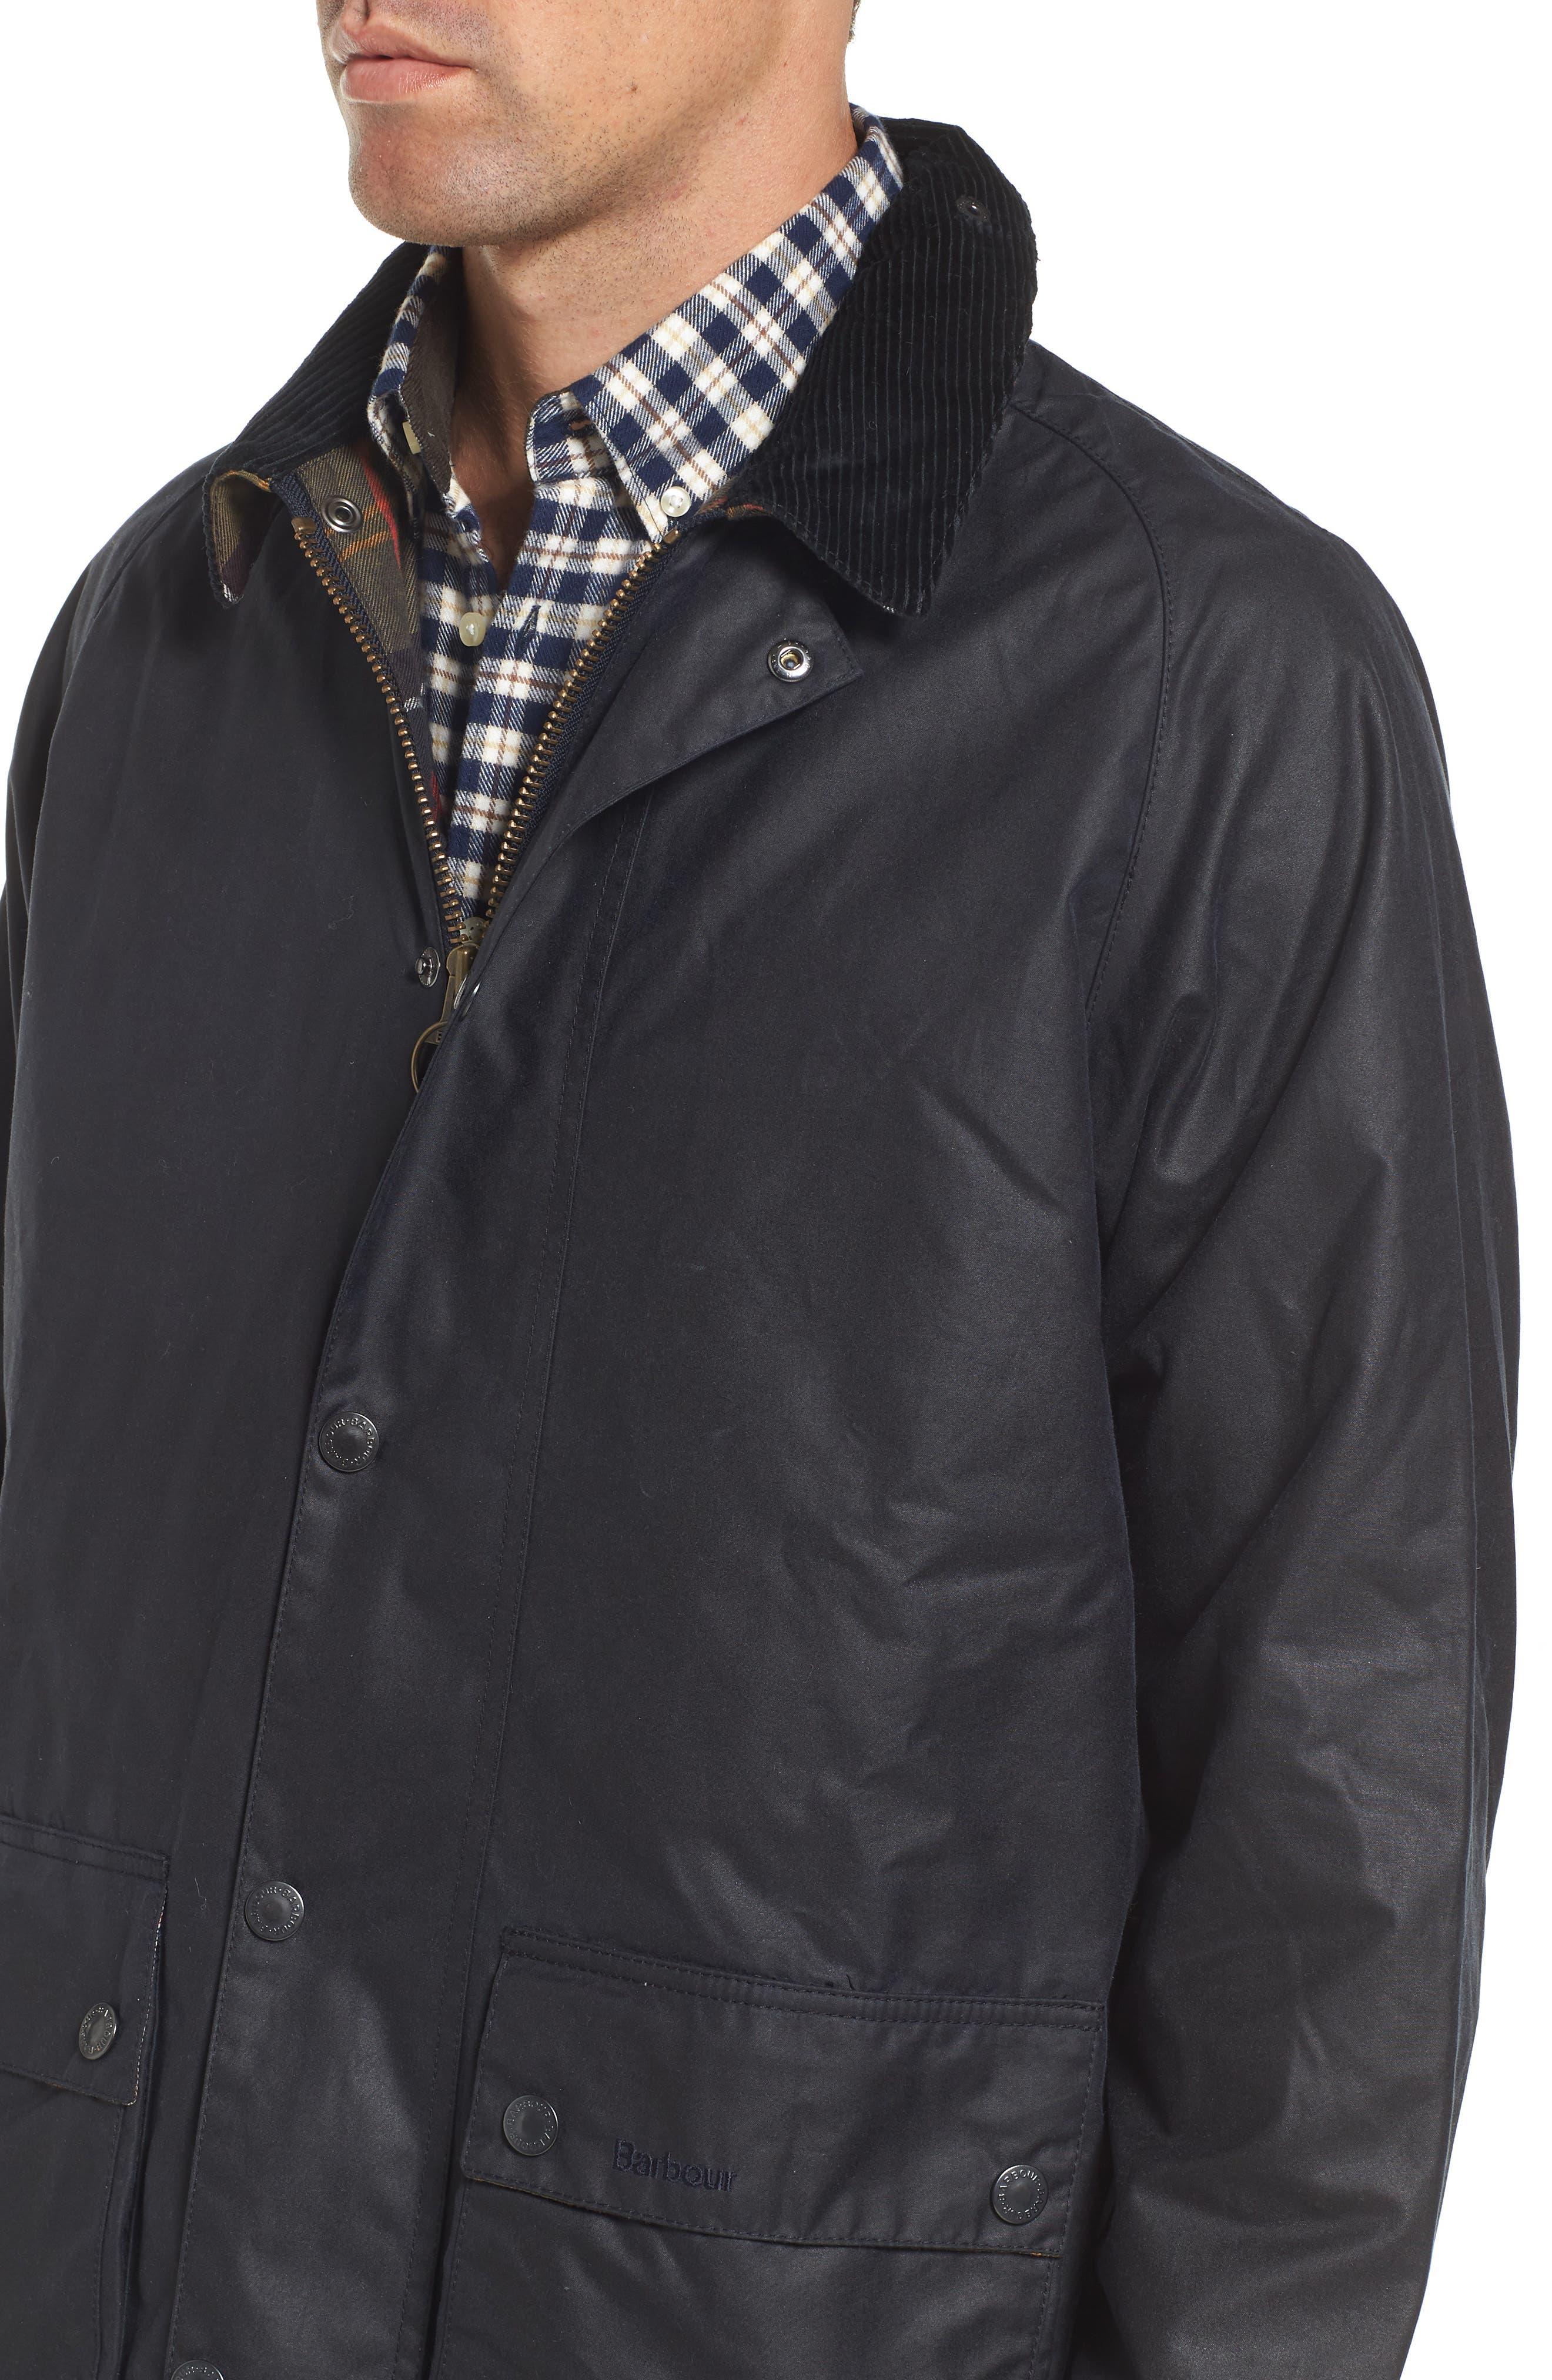 Leighton Waxed Cotton Jacket,                             Alternate thumbnail 4, color,                             Navy